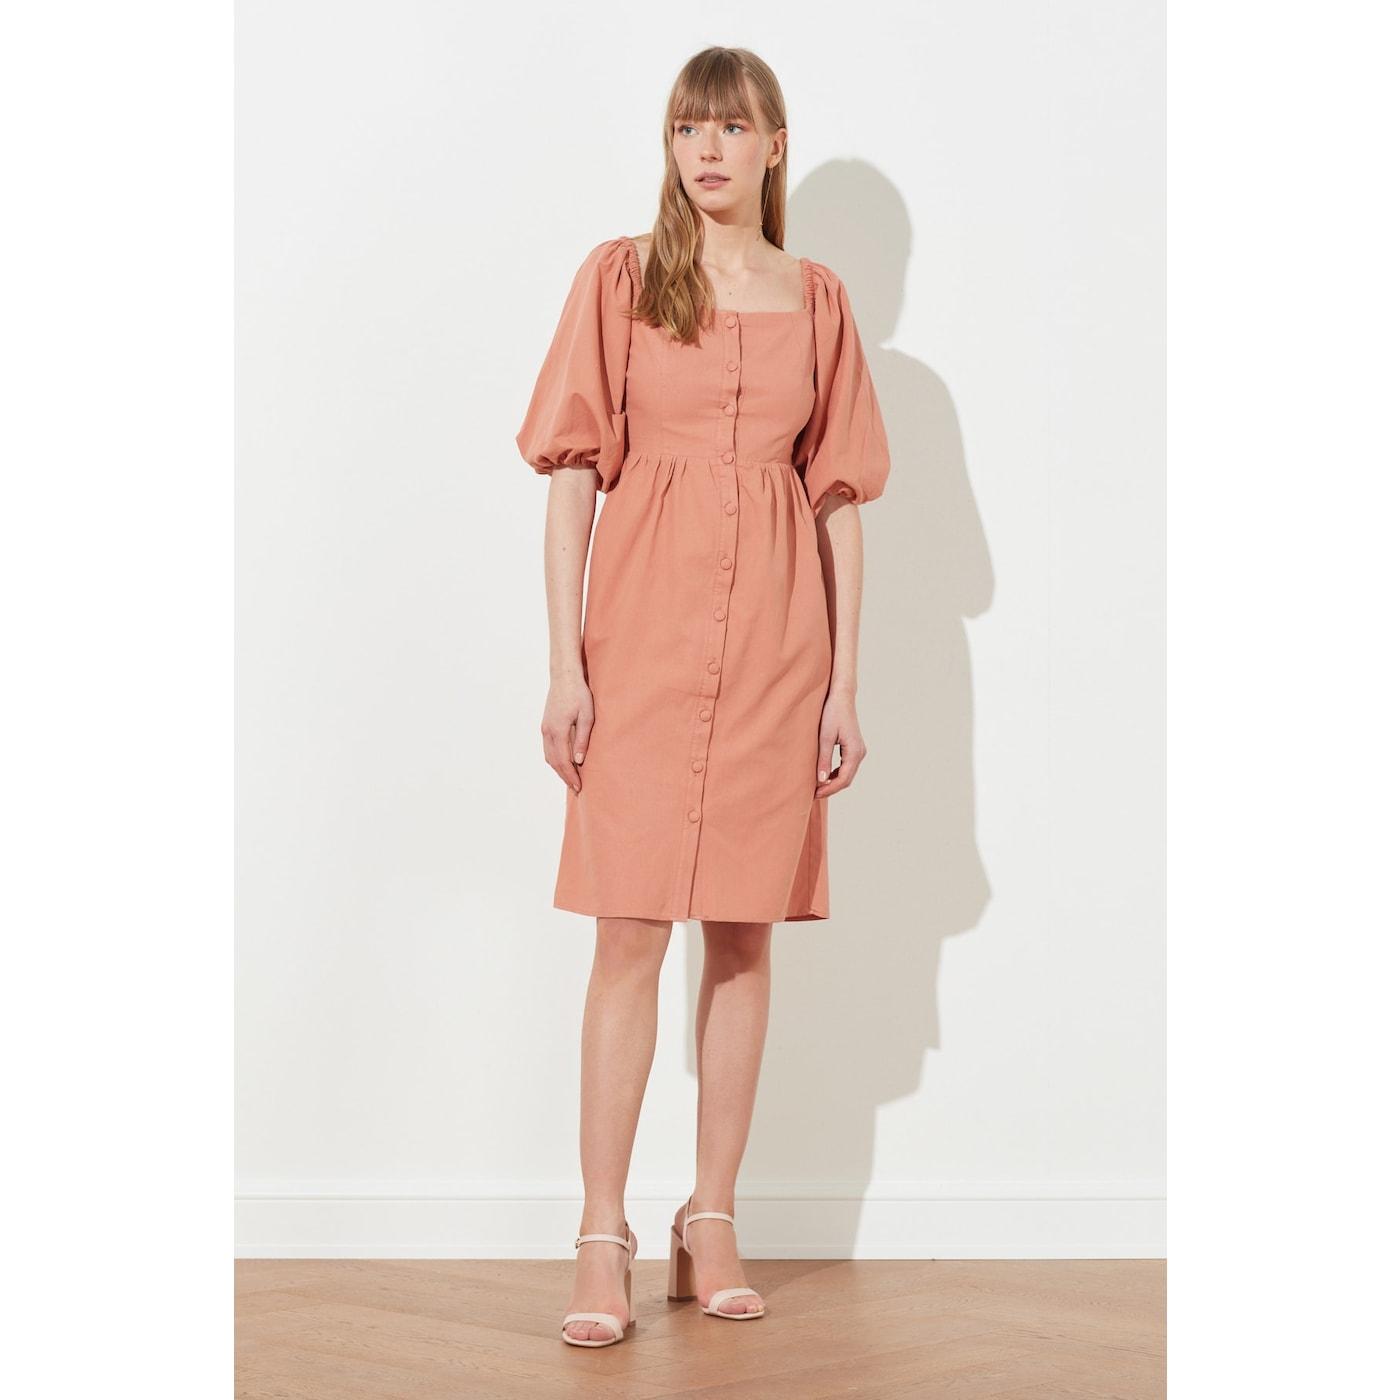 Trendyol Rose Dry Square Collar Buttoned Dress dámské 36